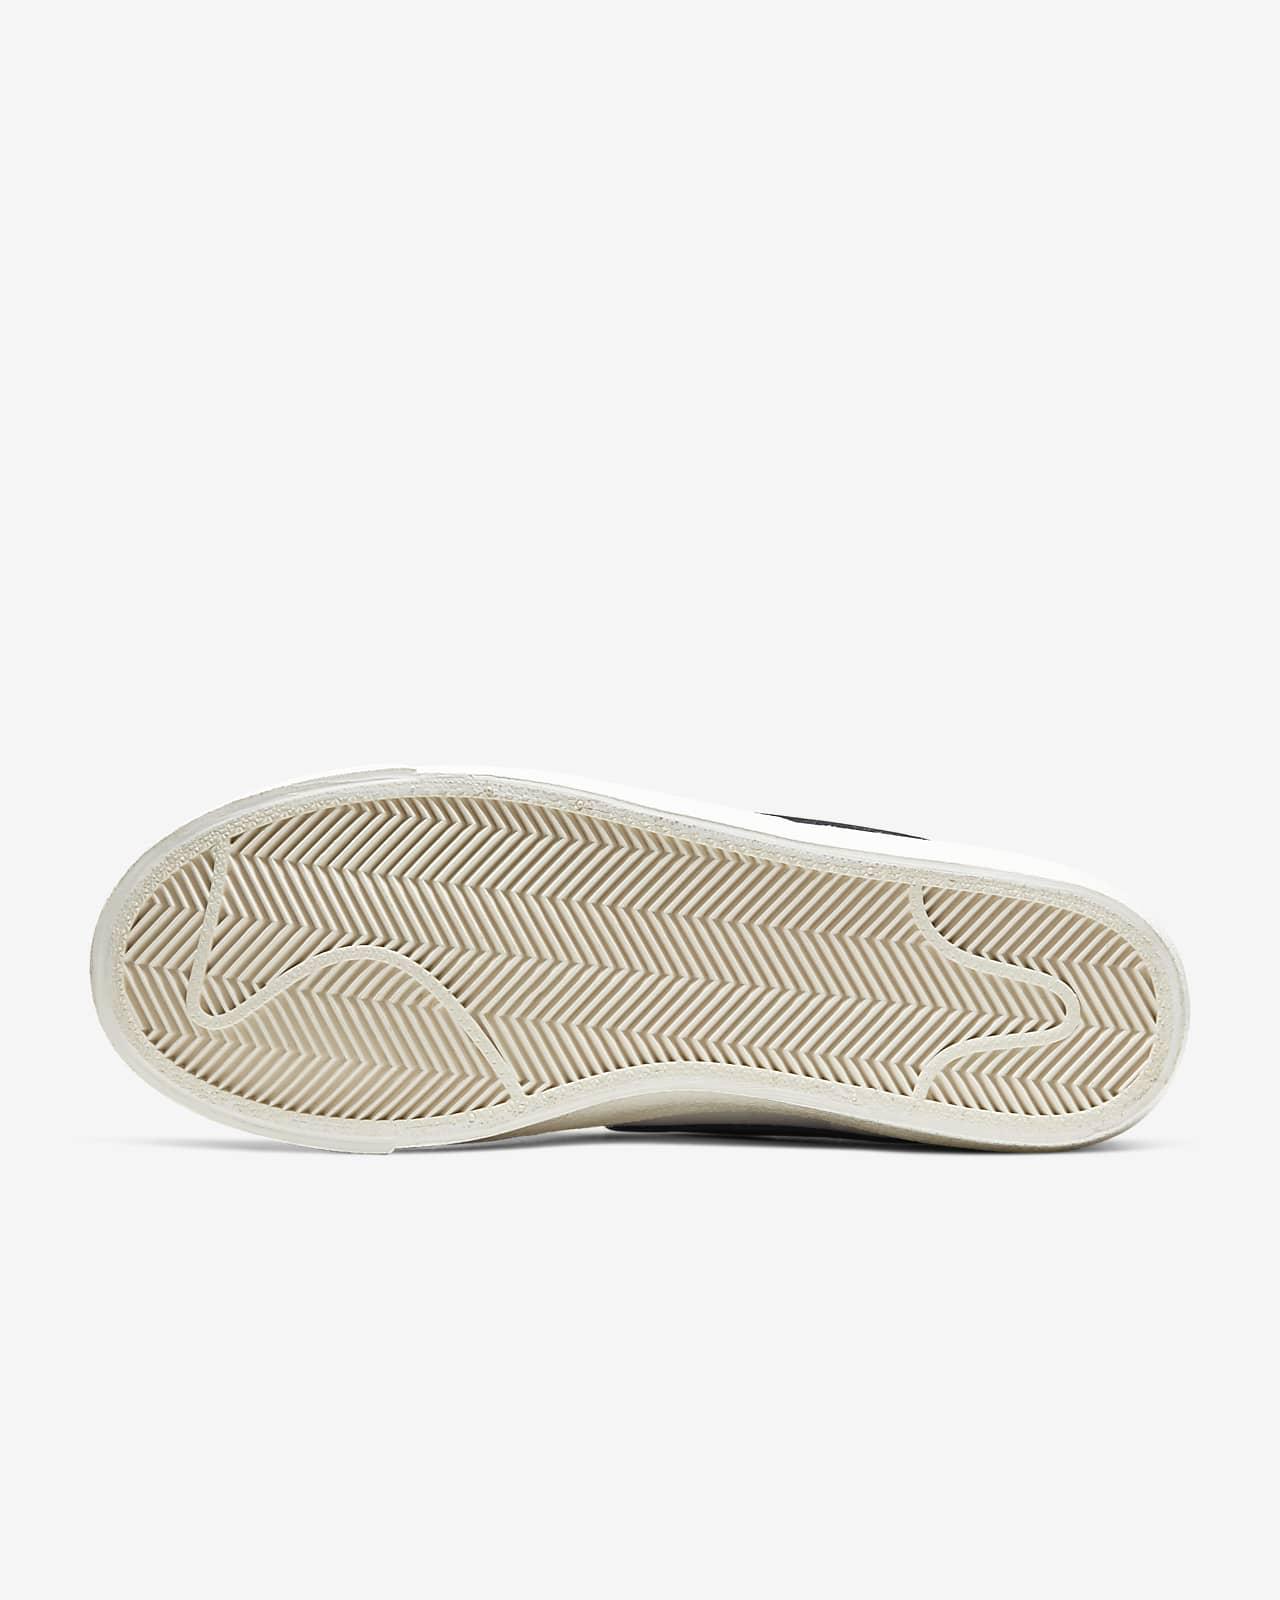 Nike Blazer Mid '77 Vintage Women's Shoe. Nike LU